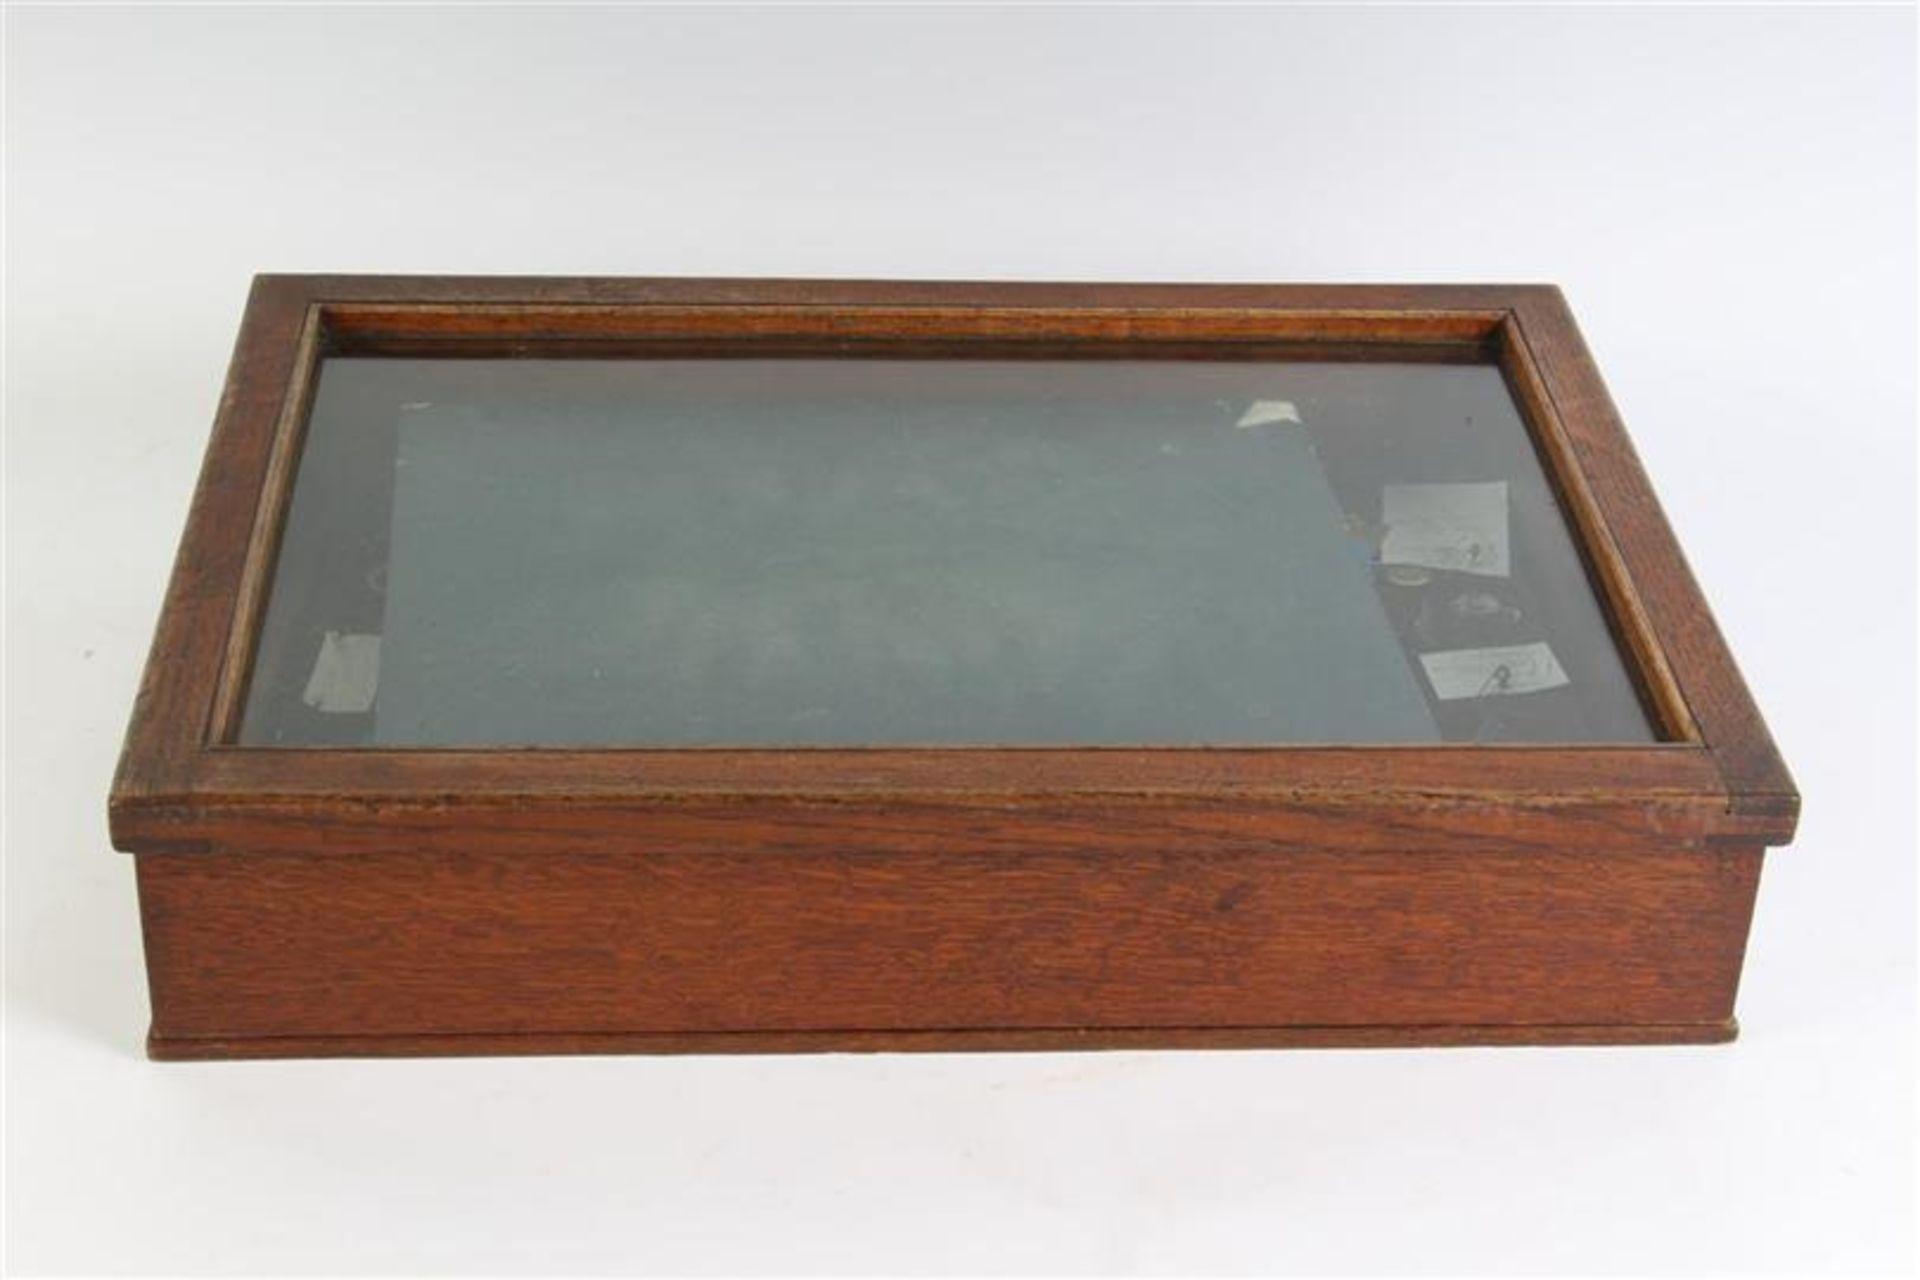 Houten tafelvitrine met sieraden. HxBxD: 55.5 x 37 x 13.5 cm.